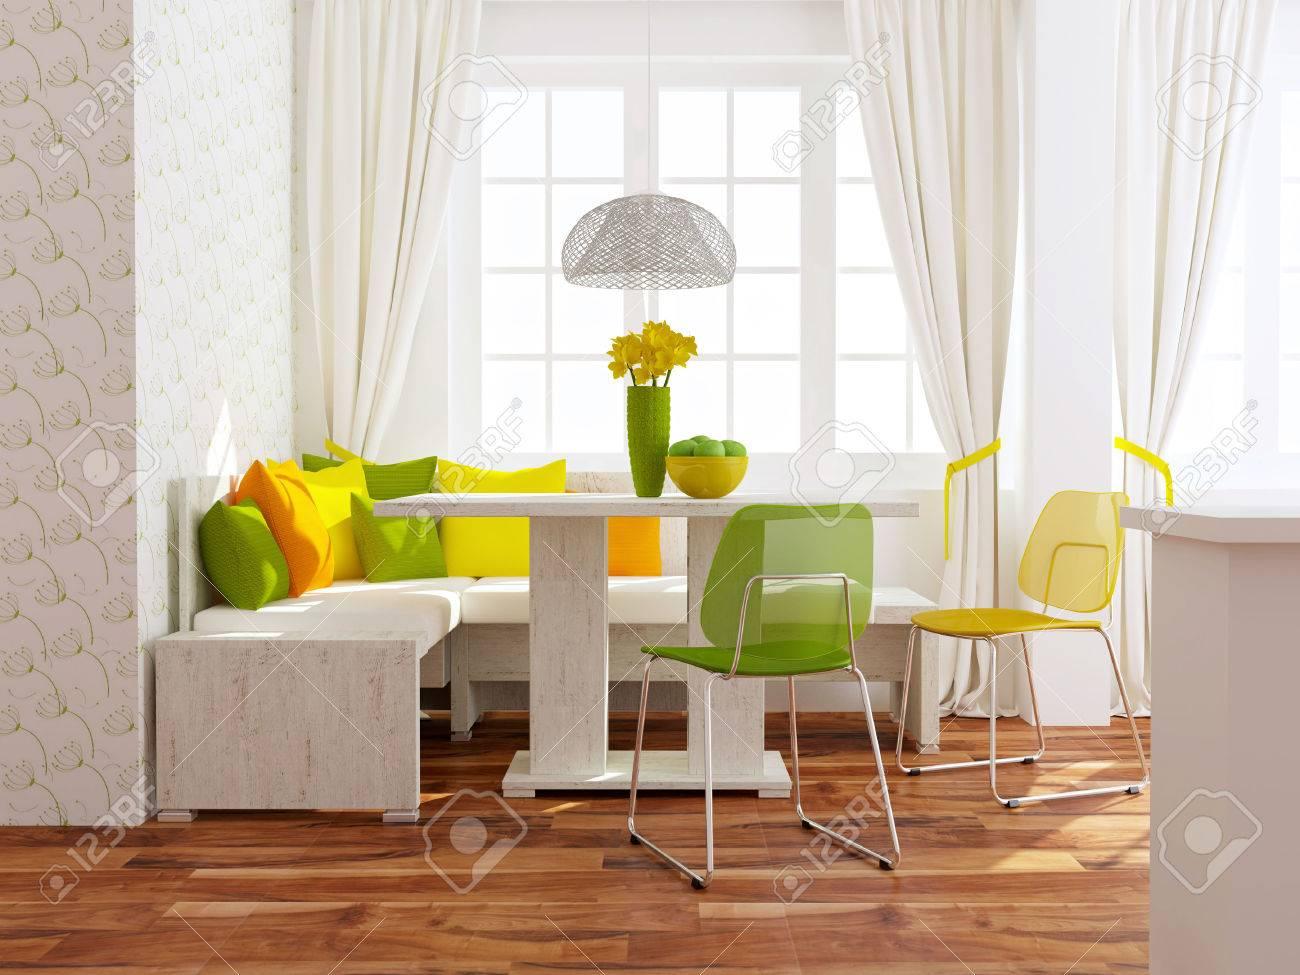 Diseño moderno interior. Comedor contemporáneo.